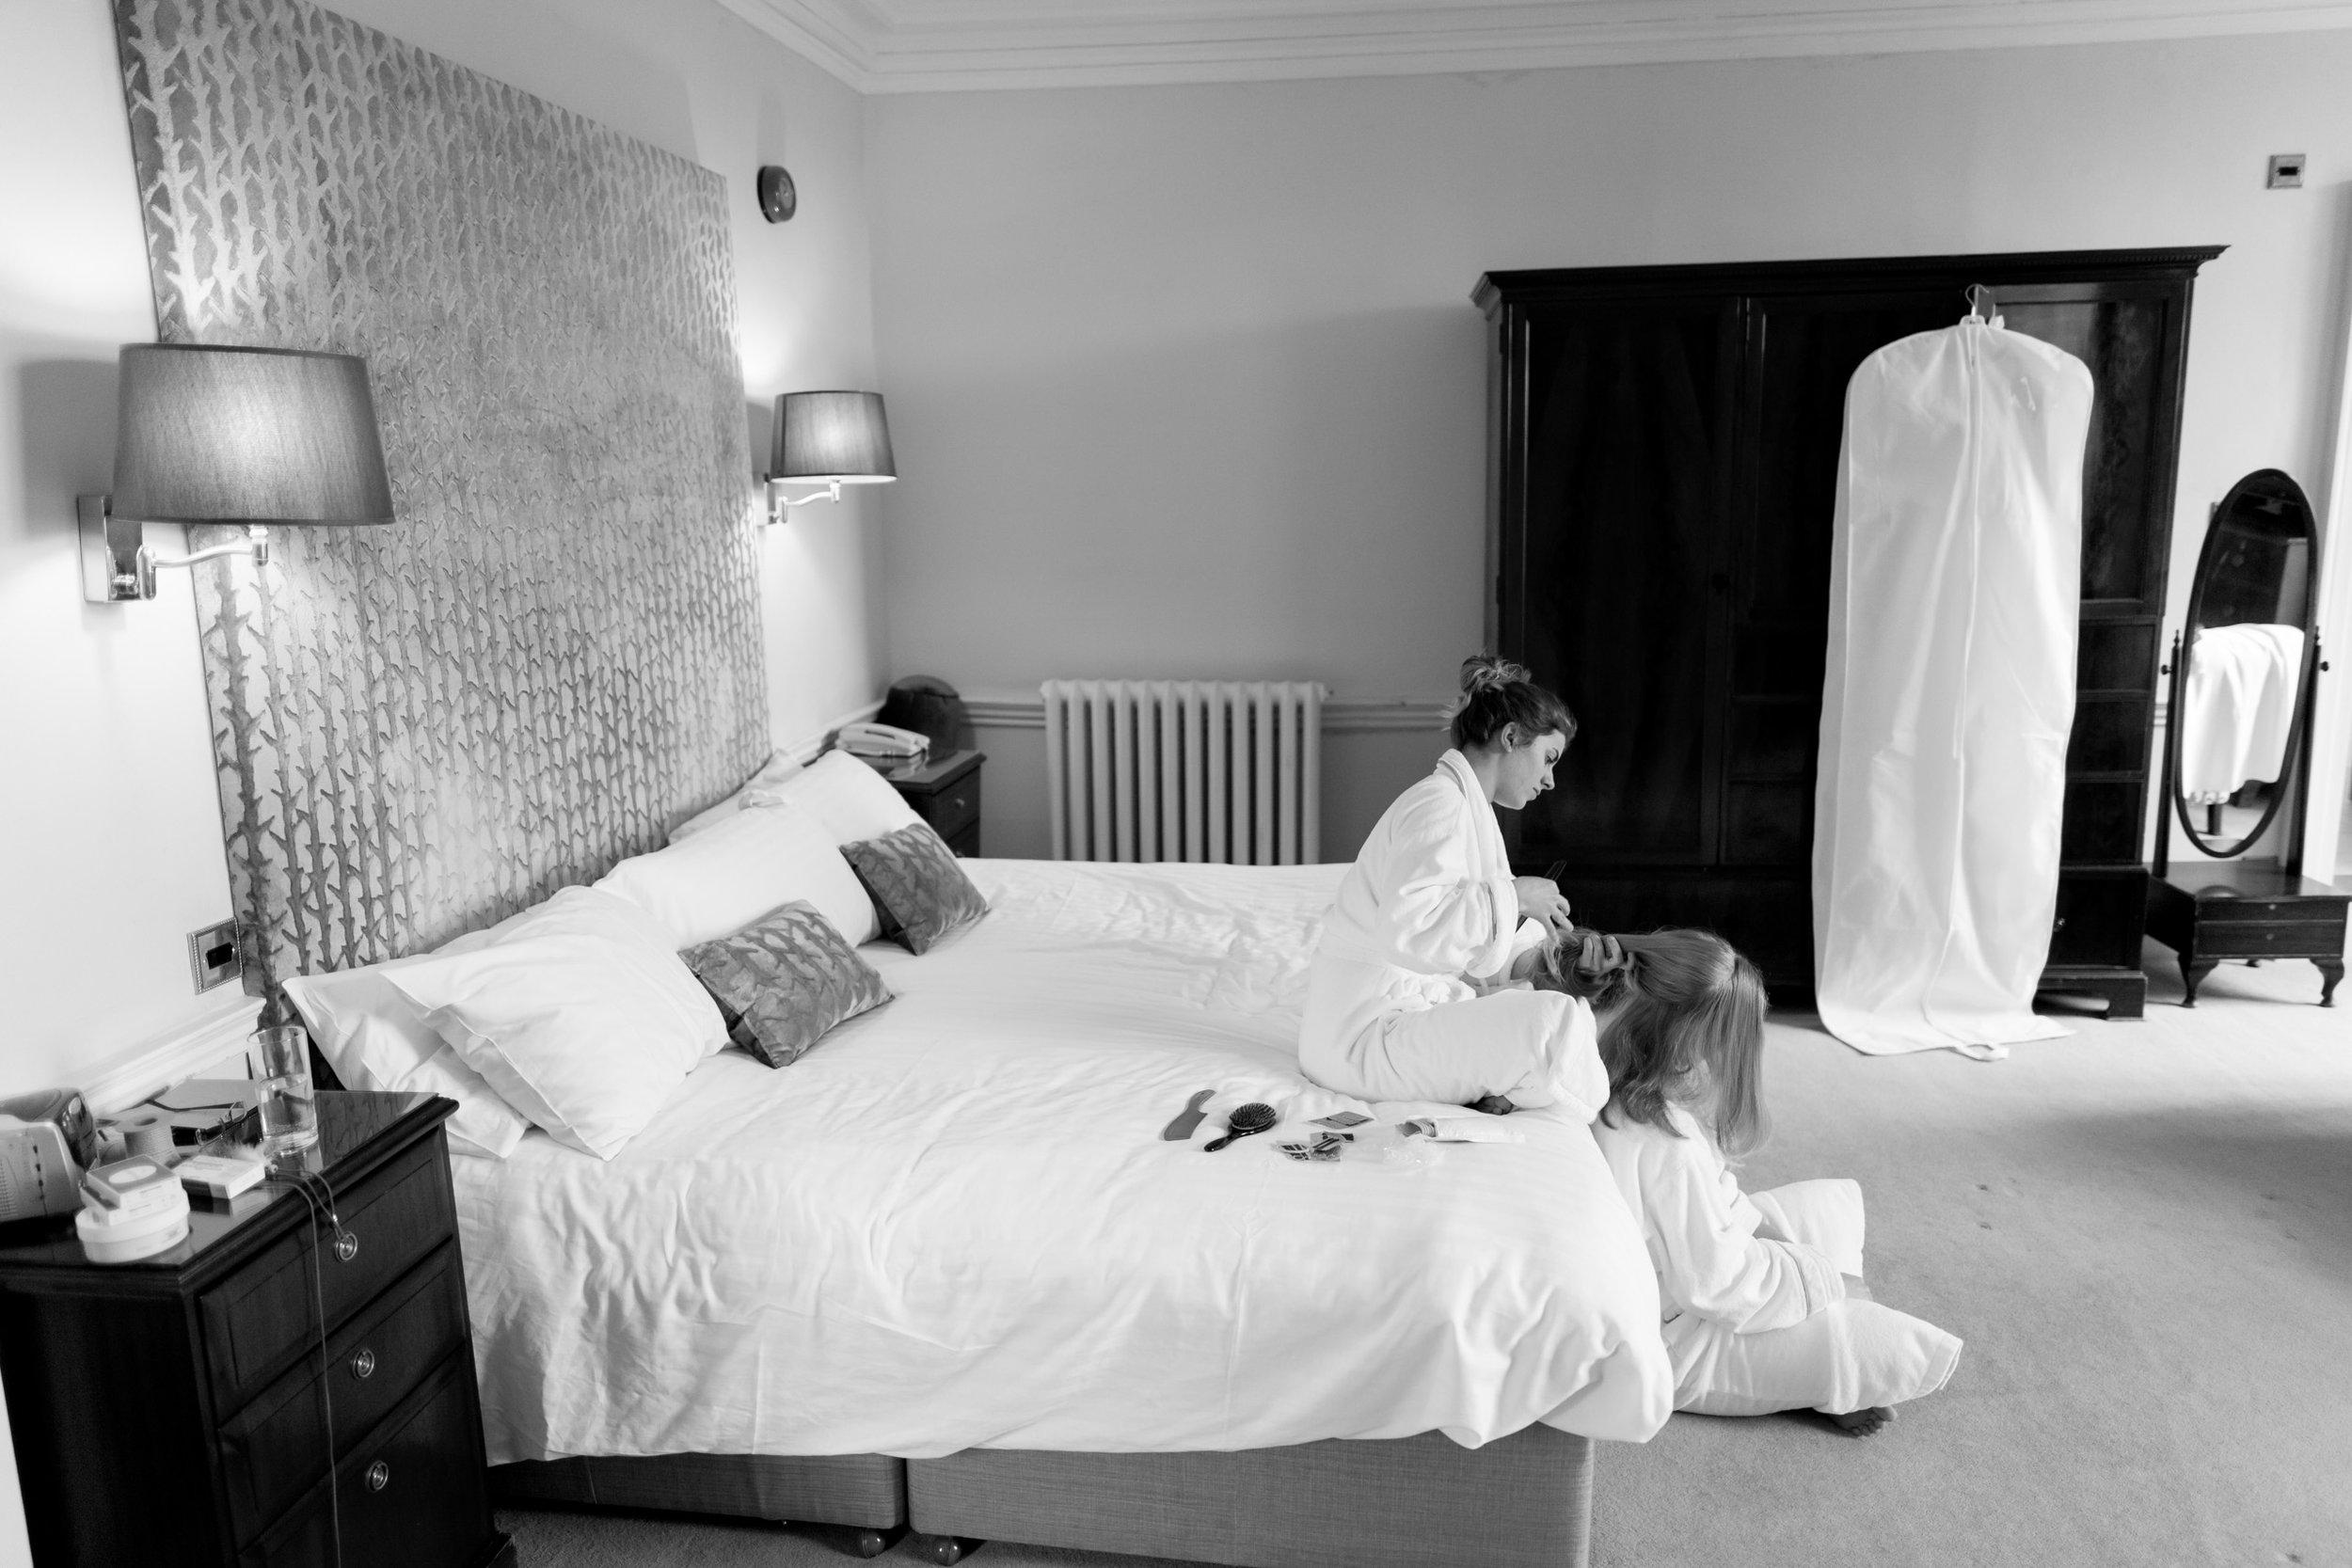 Bucklands-Tout-Saints-Hotel-Devon-Wedding-Photography-2.jpg